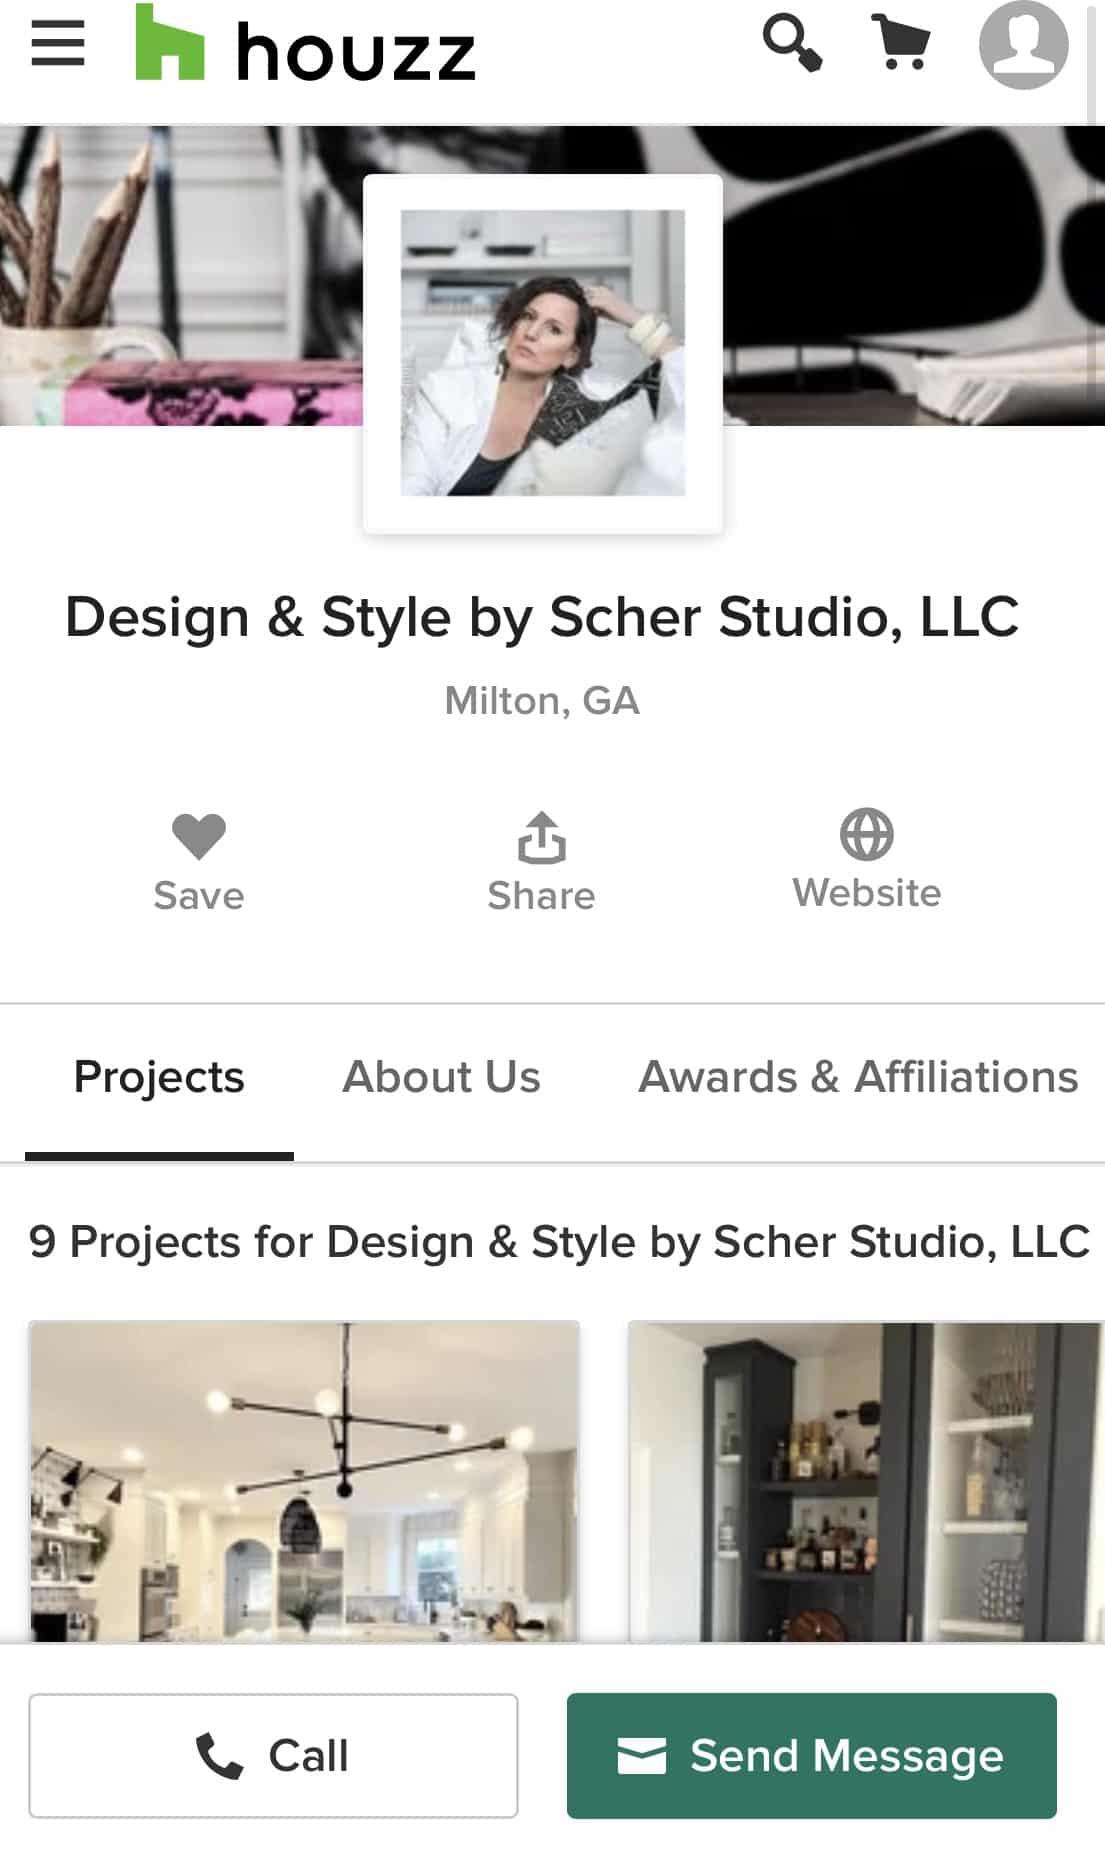 Houzz profile of Design & Style by Stephanie Scher